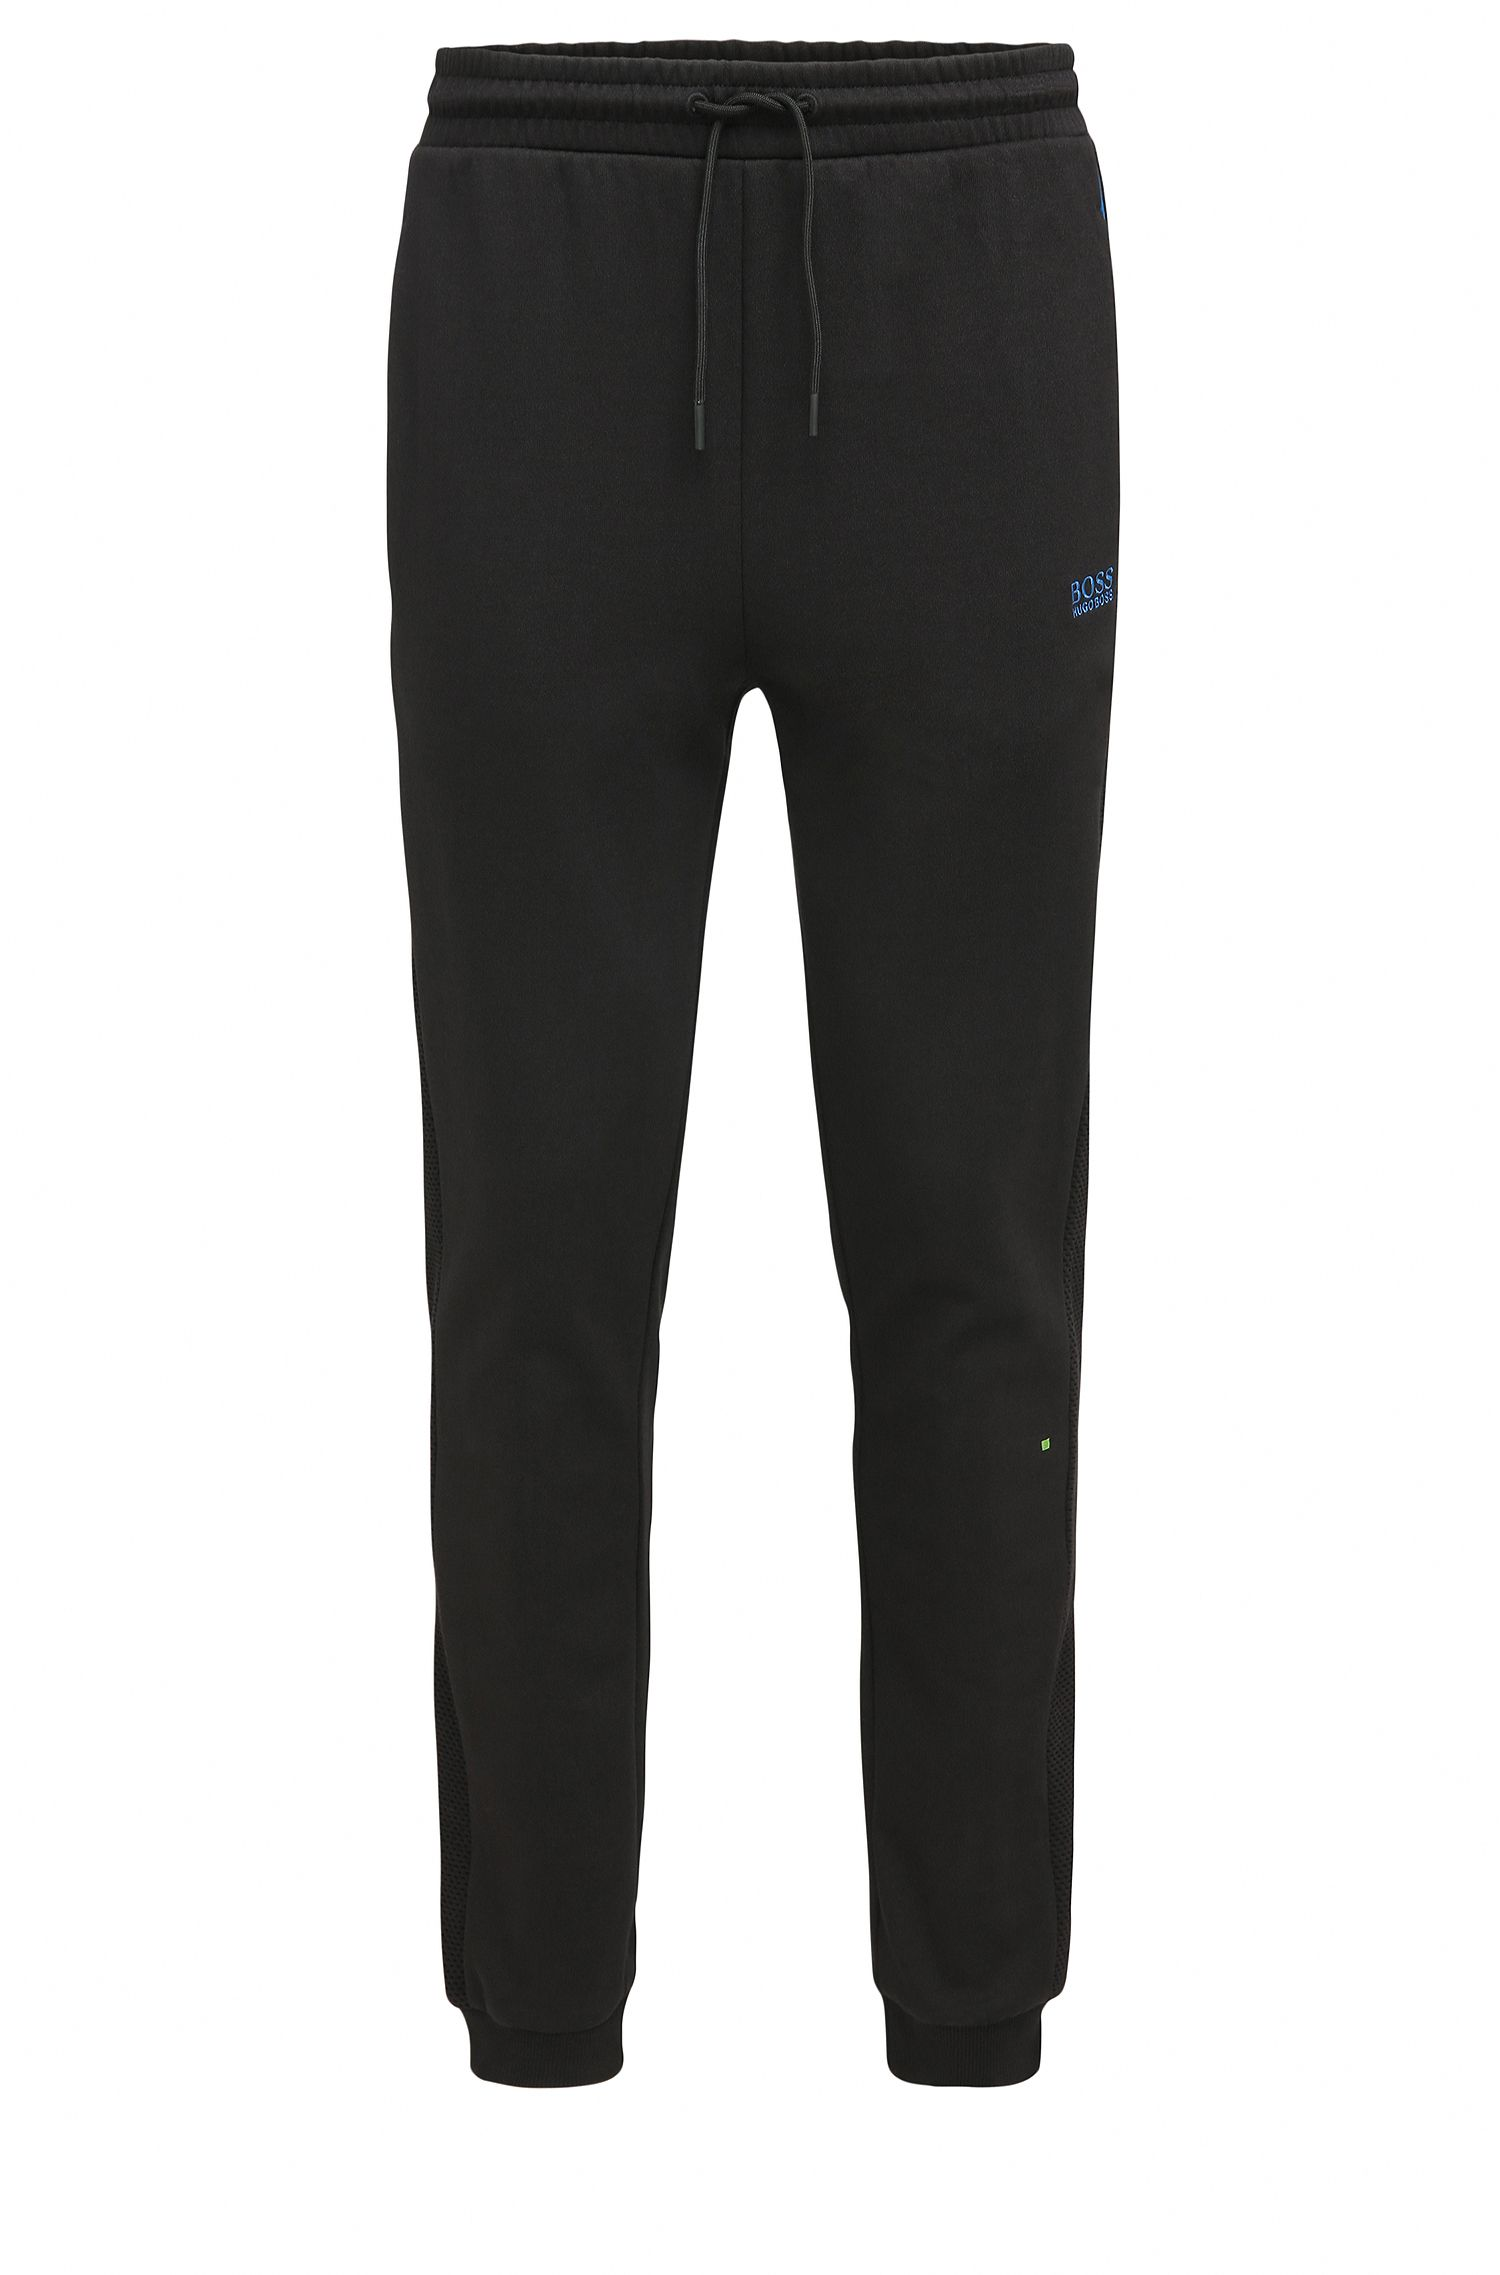 'Hivon' | Stretch Cotton Pants